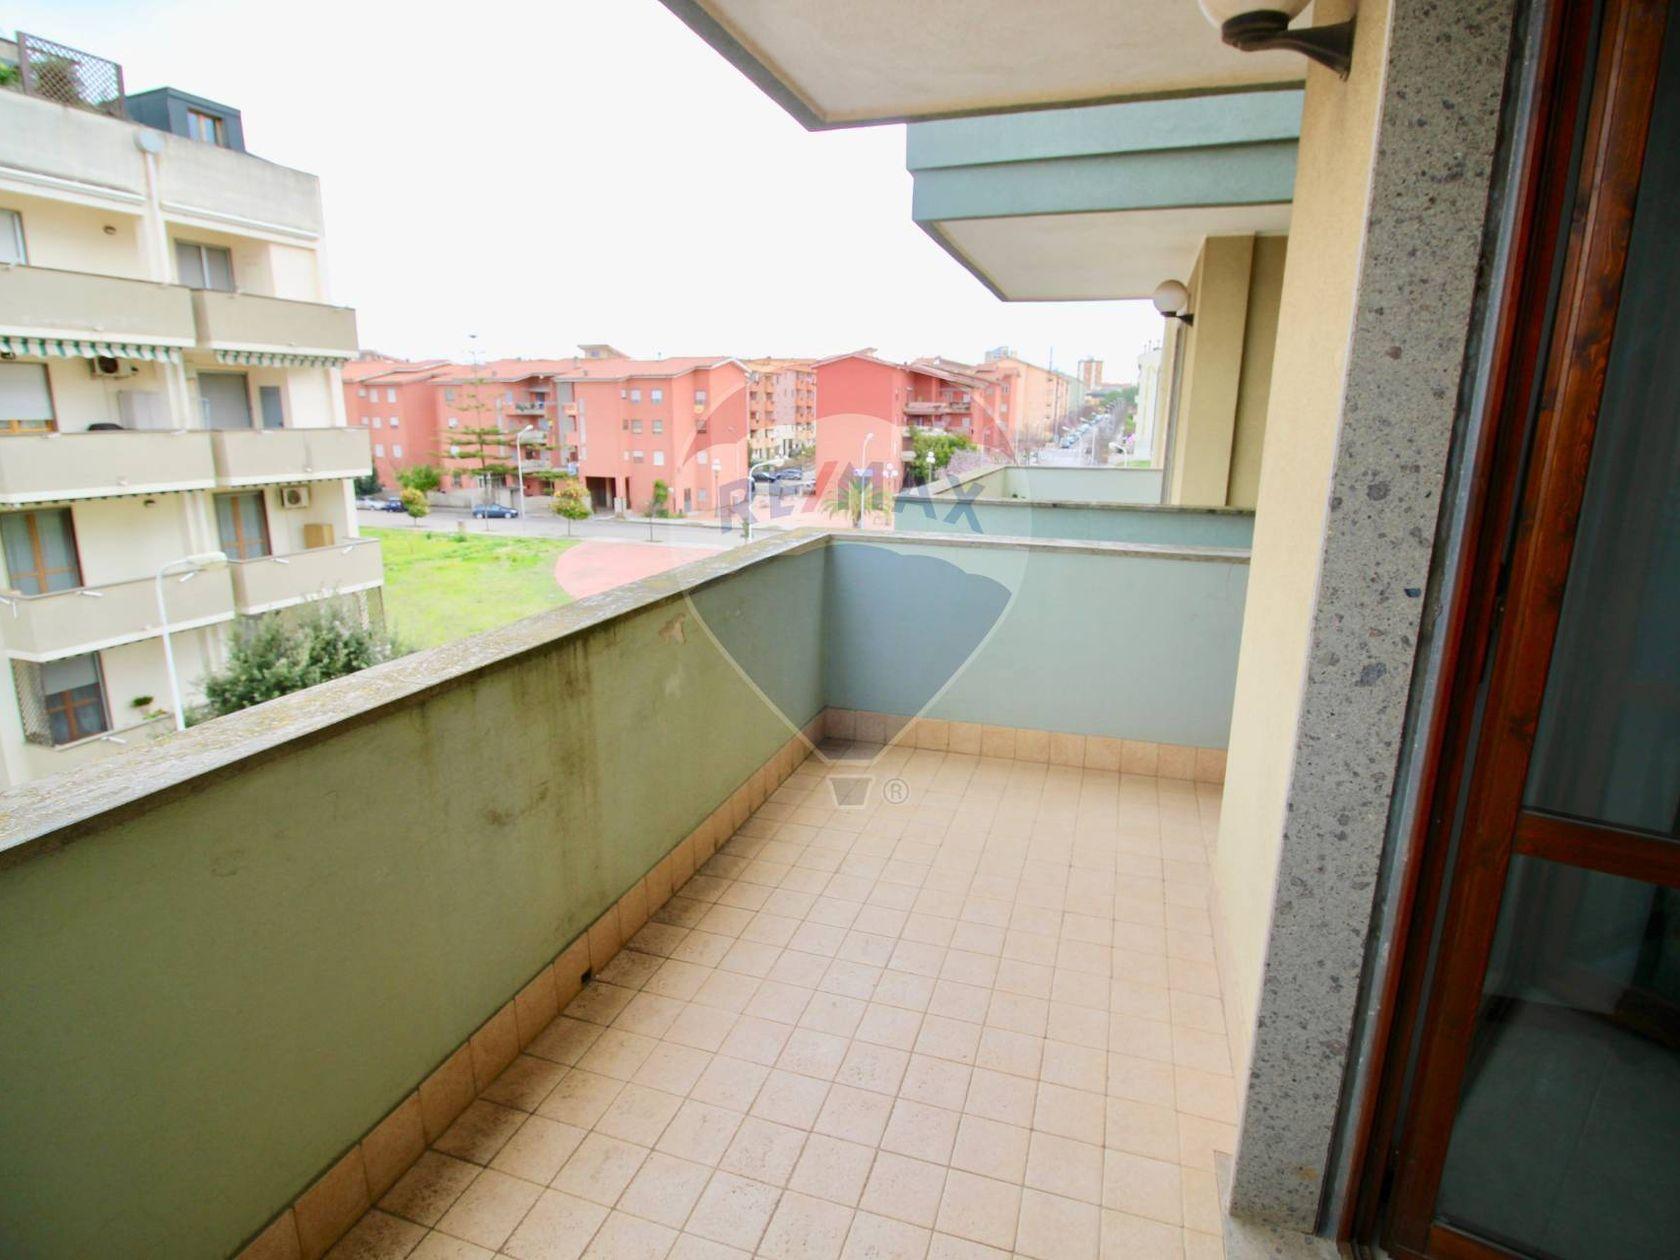 Appartamento Ss-s. Orsola Storica, Sassari, SS Vendita - Foto 3